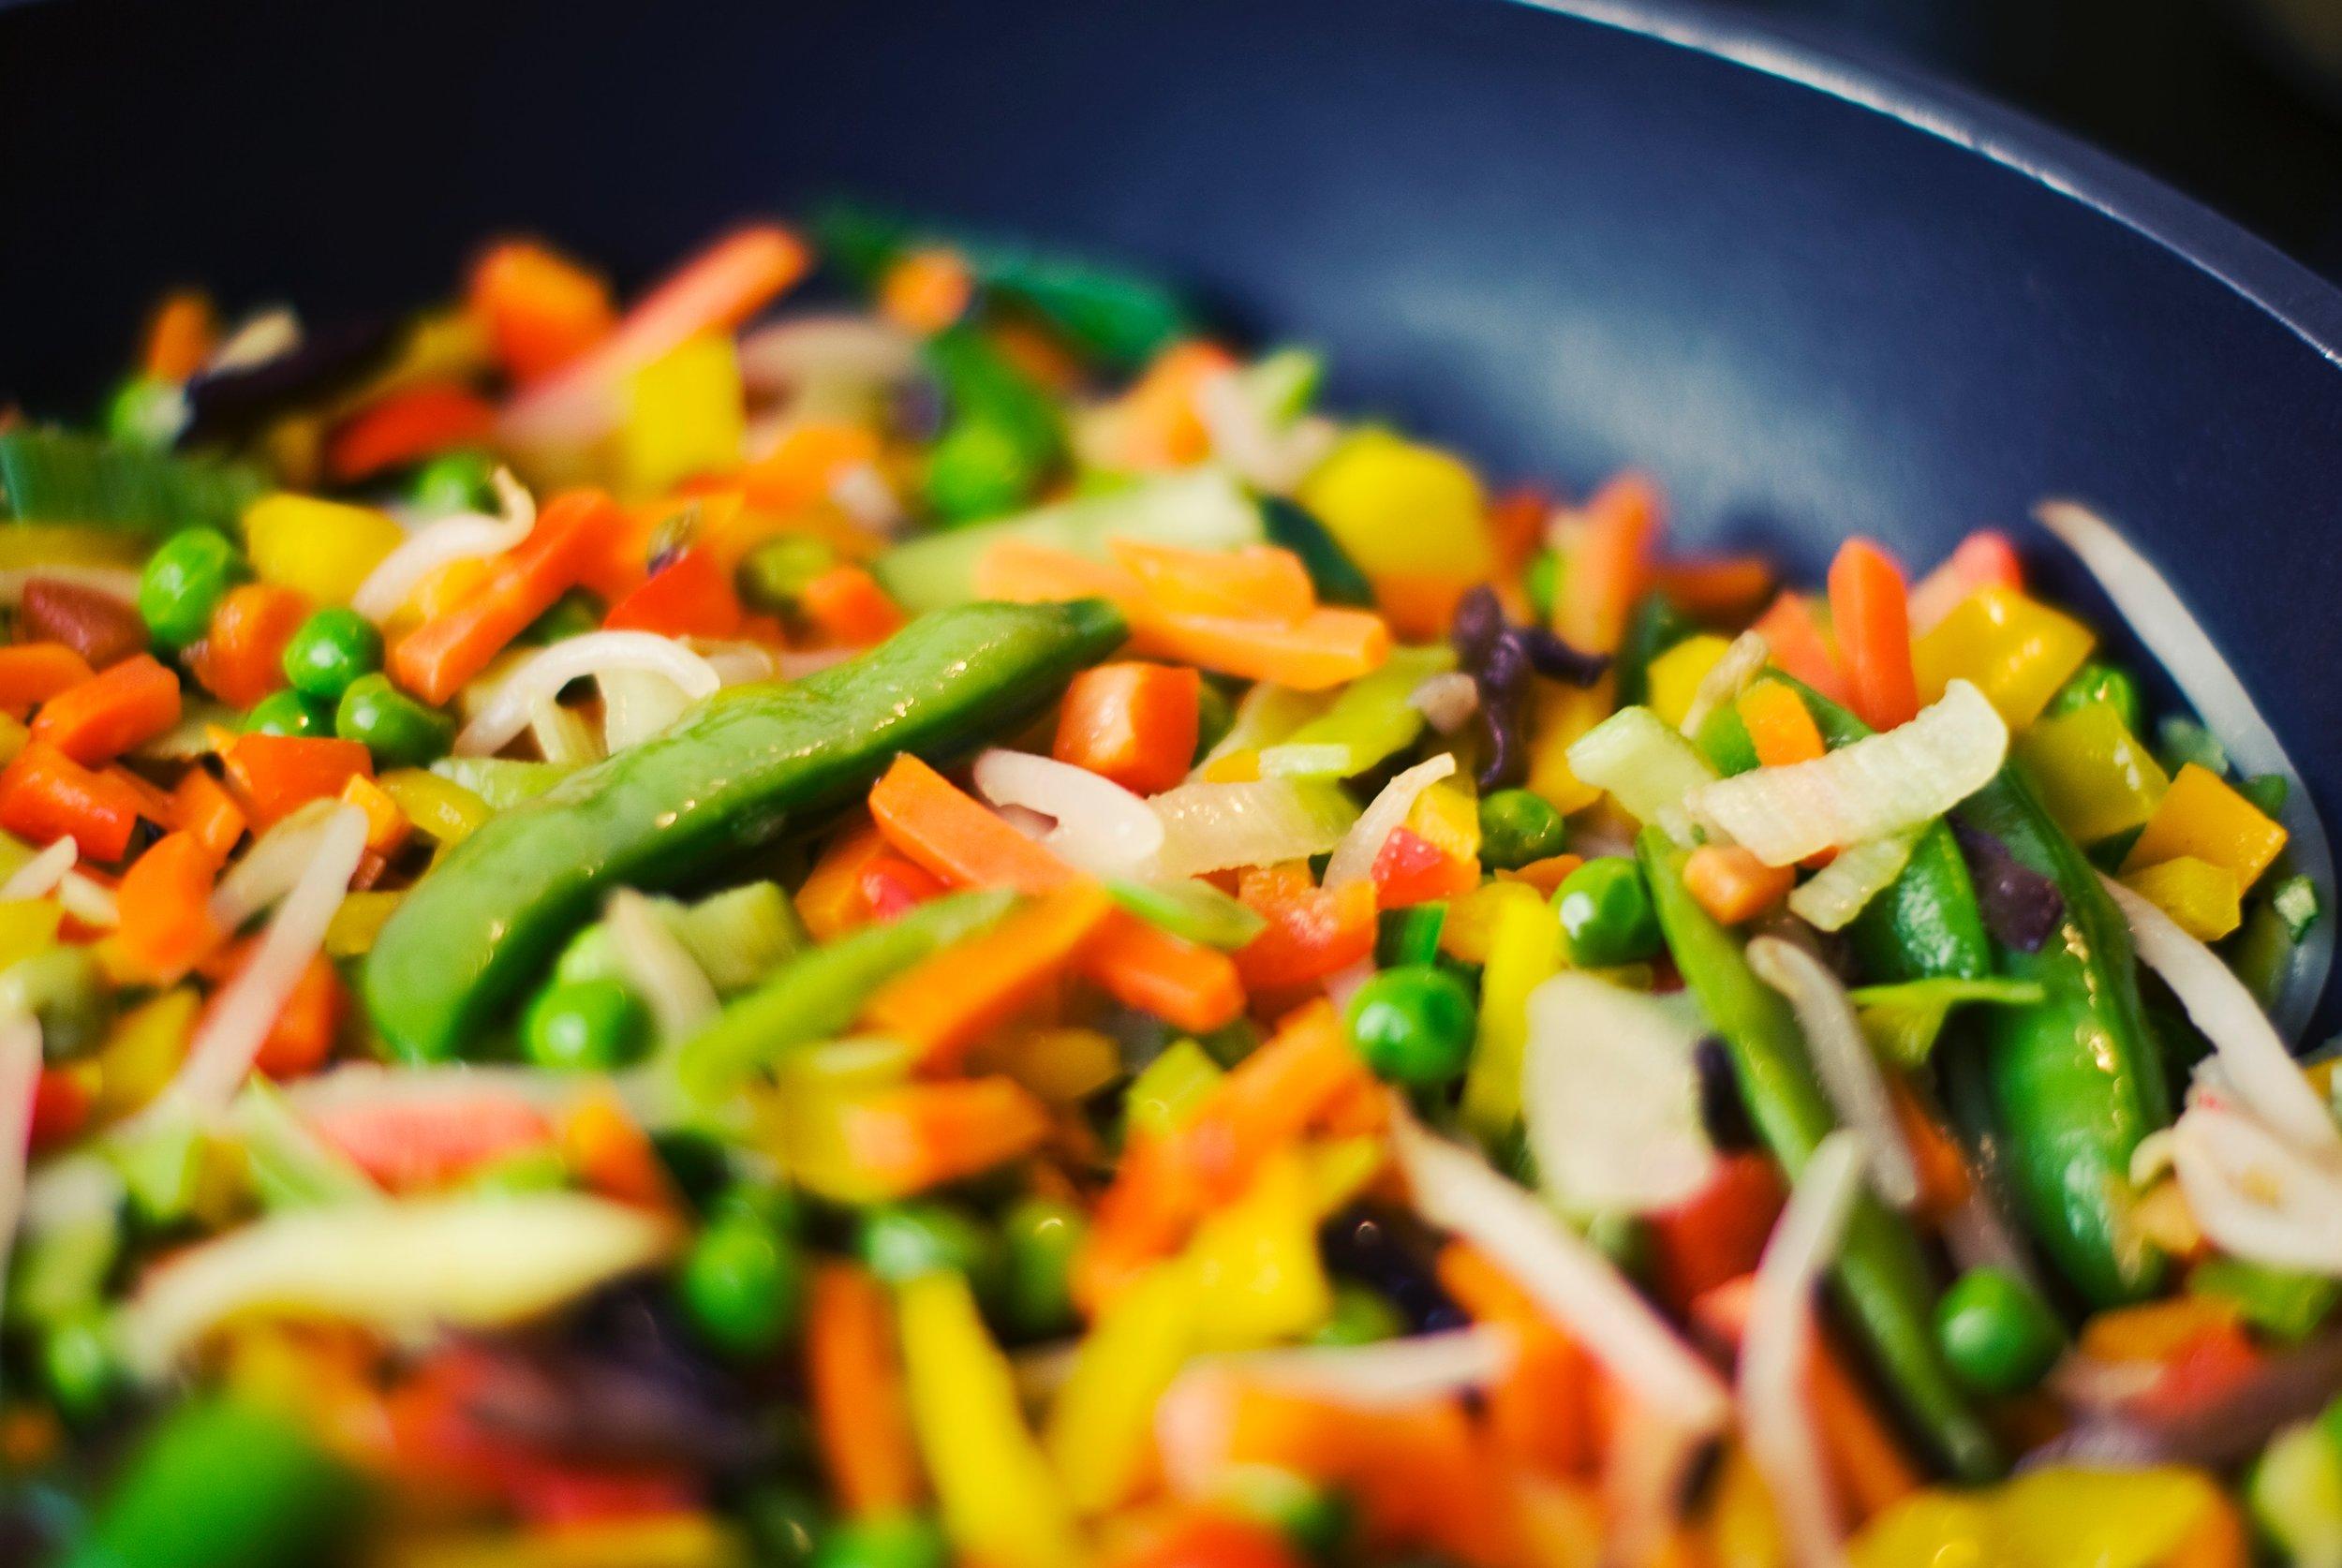 asian-carrots-cooking-8718.jpg